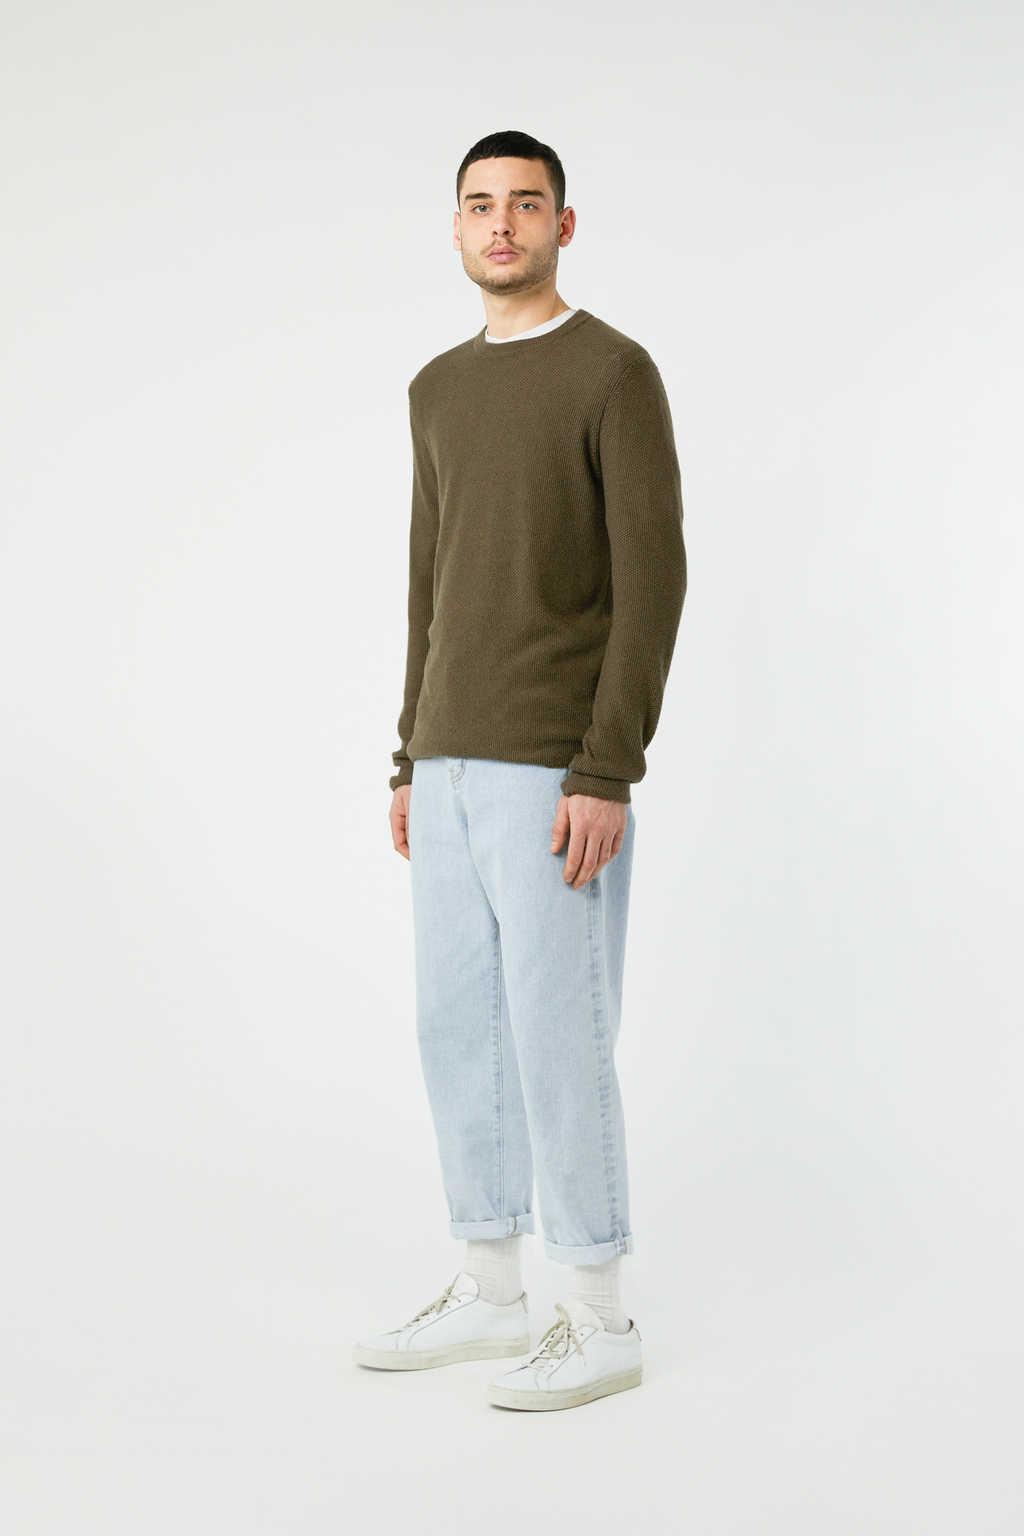 Sweater 2849 Olive 8